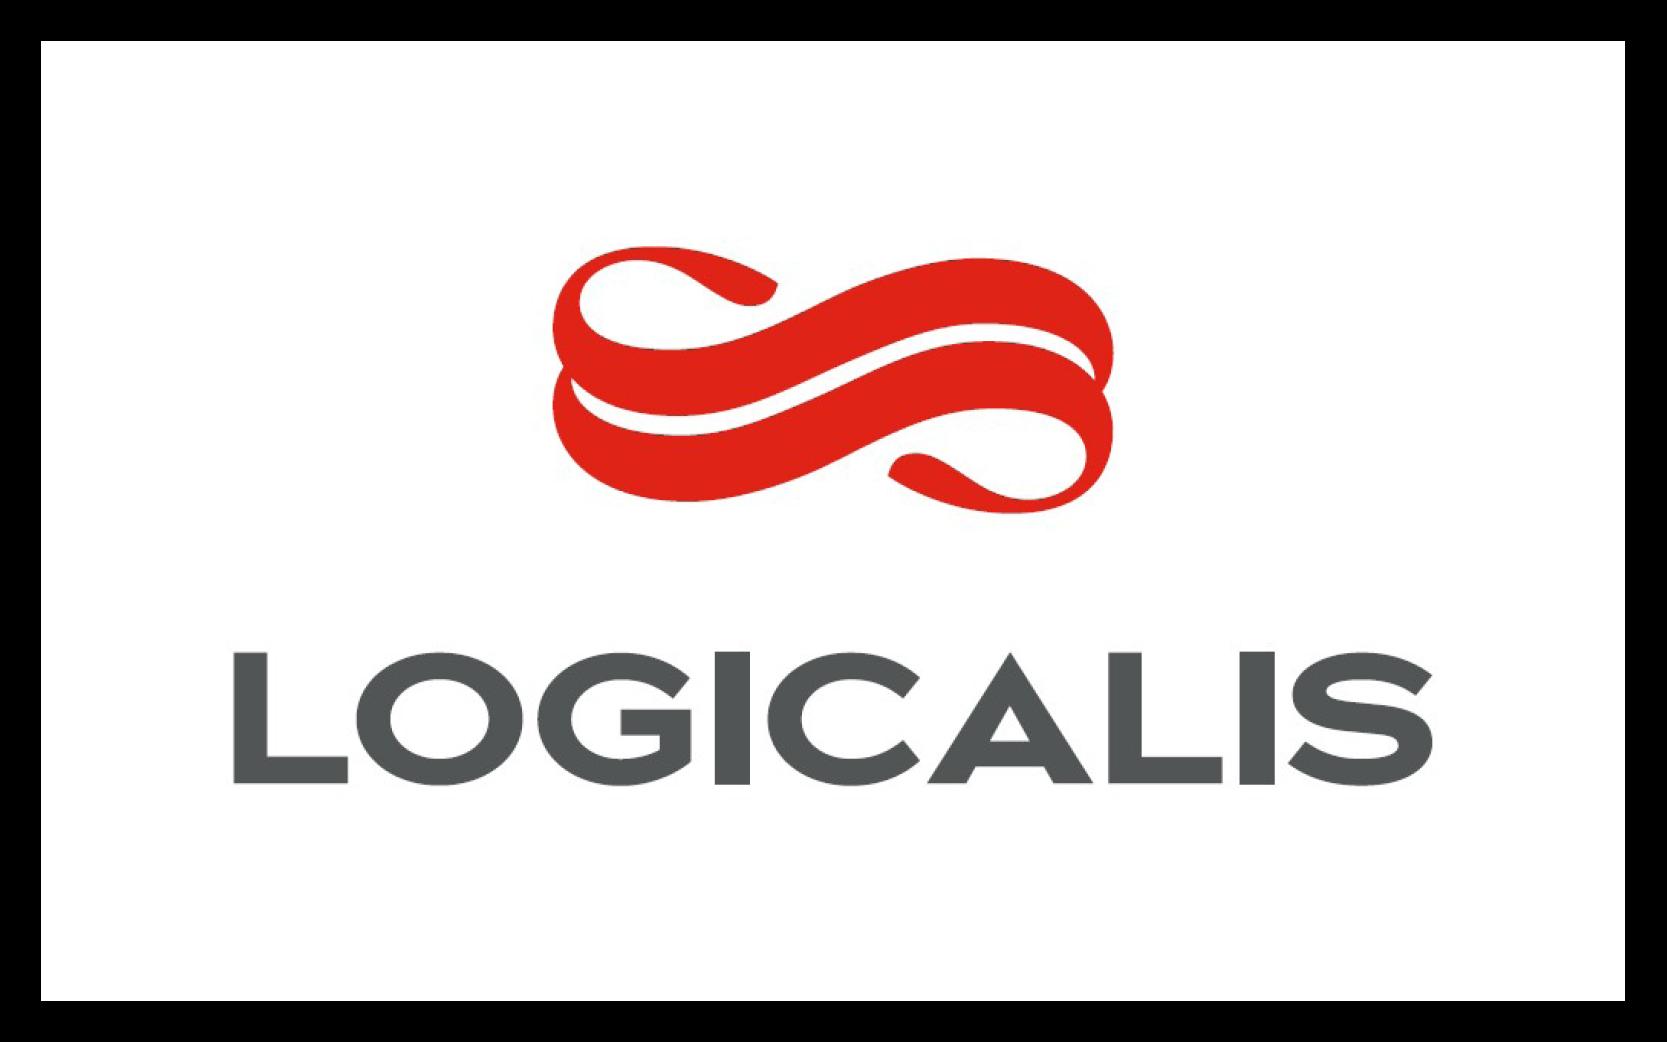 logiscalis, cloud hosting, jd edwards